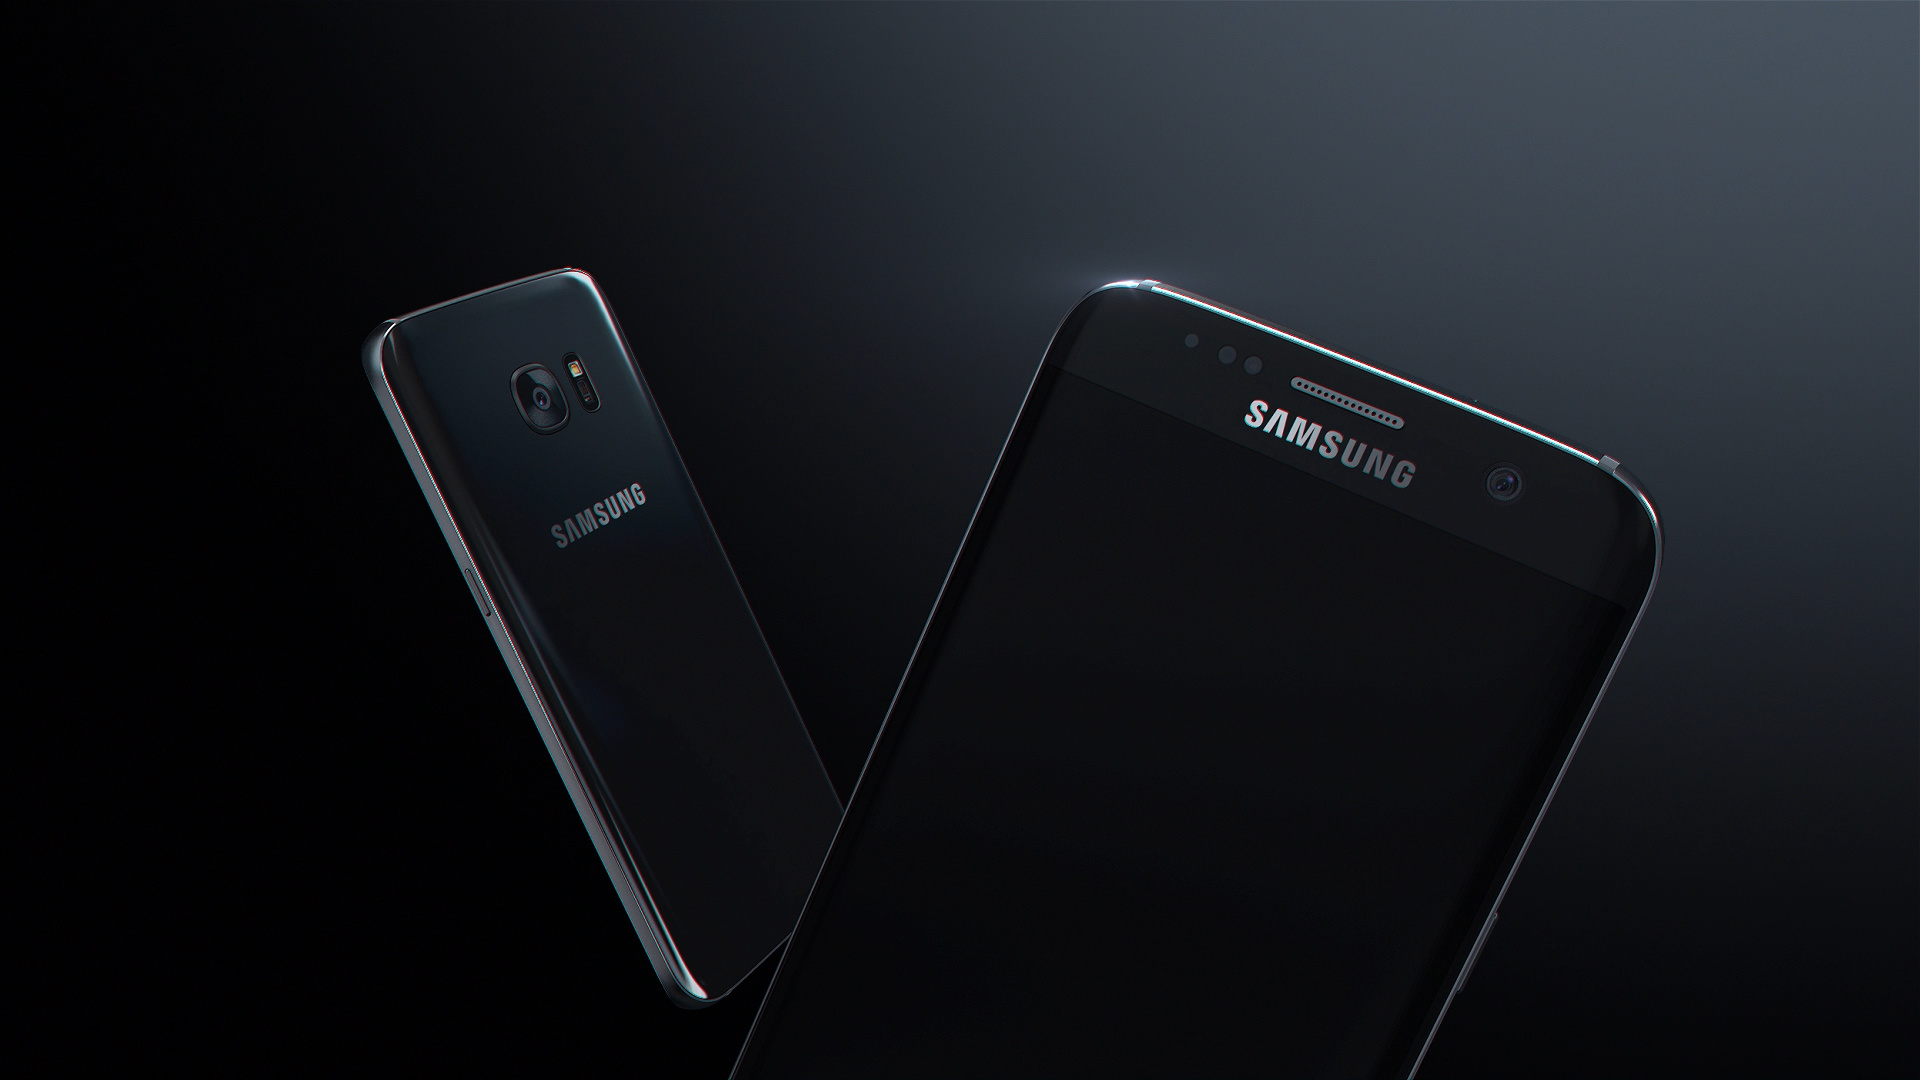 Samsung Galaxy S7 Sd Karte Maximale Größe.Samsung Galaxy S7 Edge S7 Business Solutions